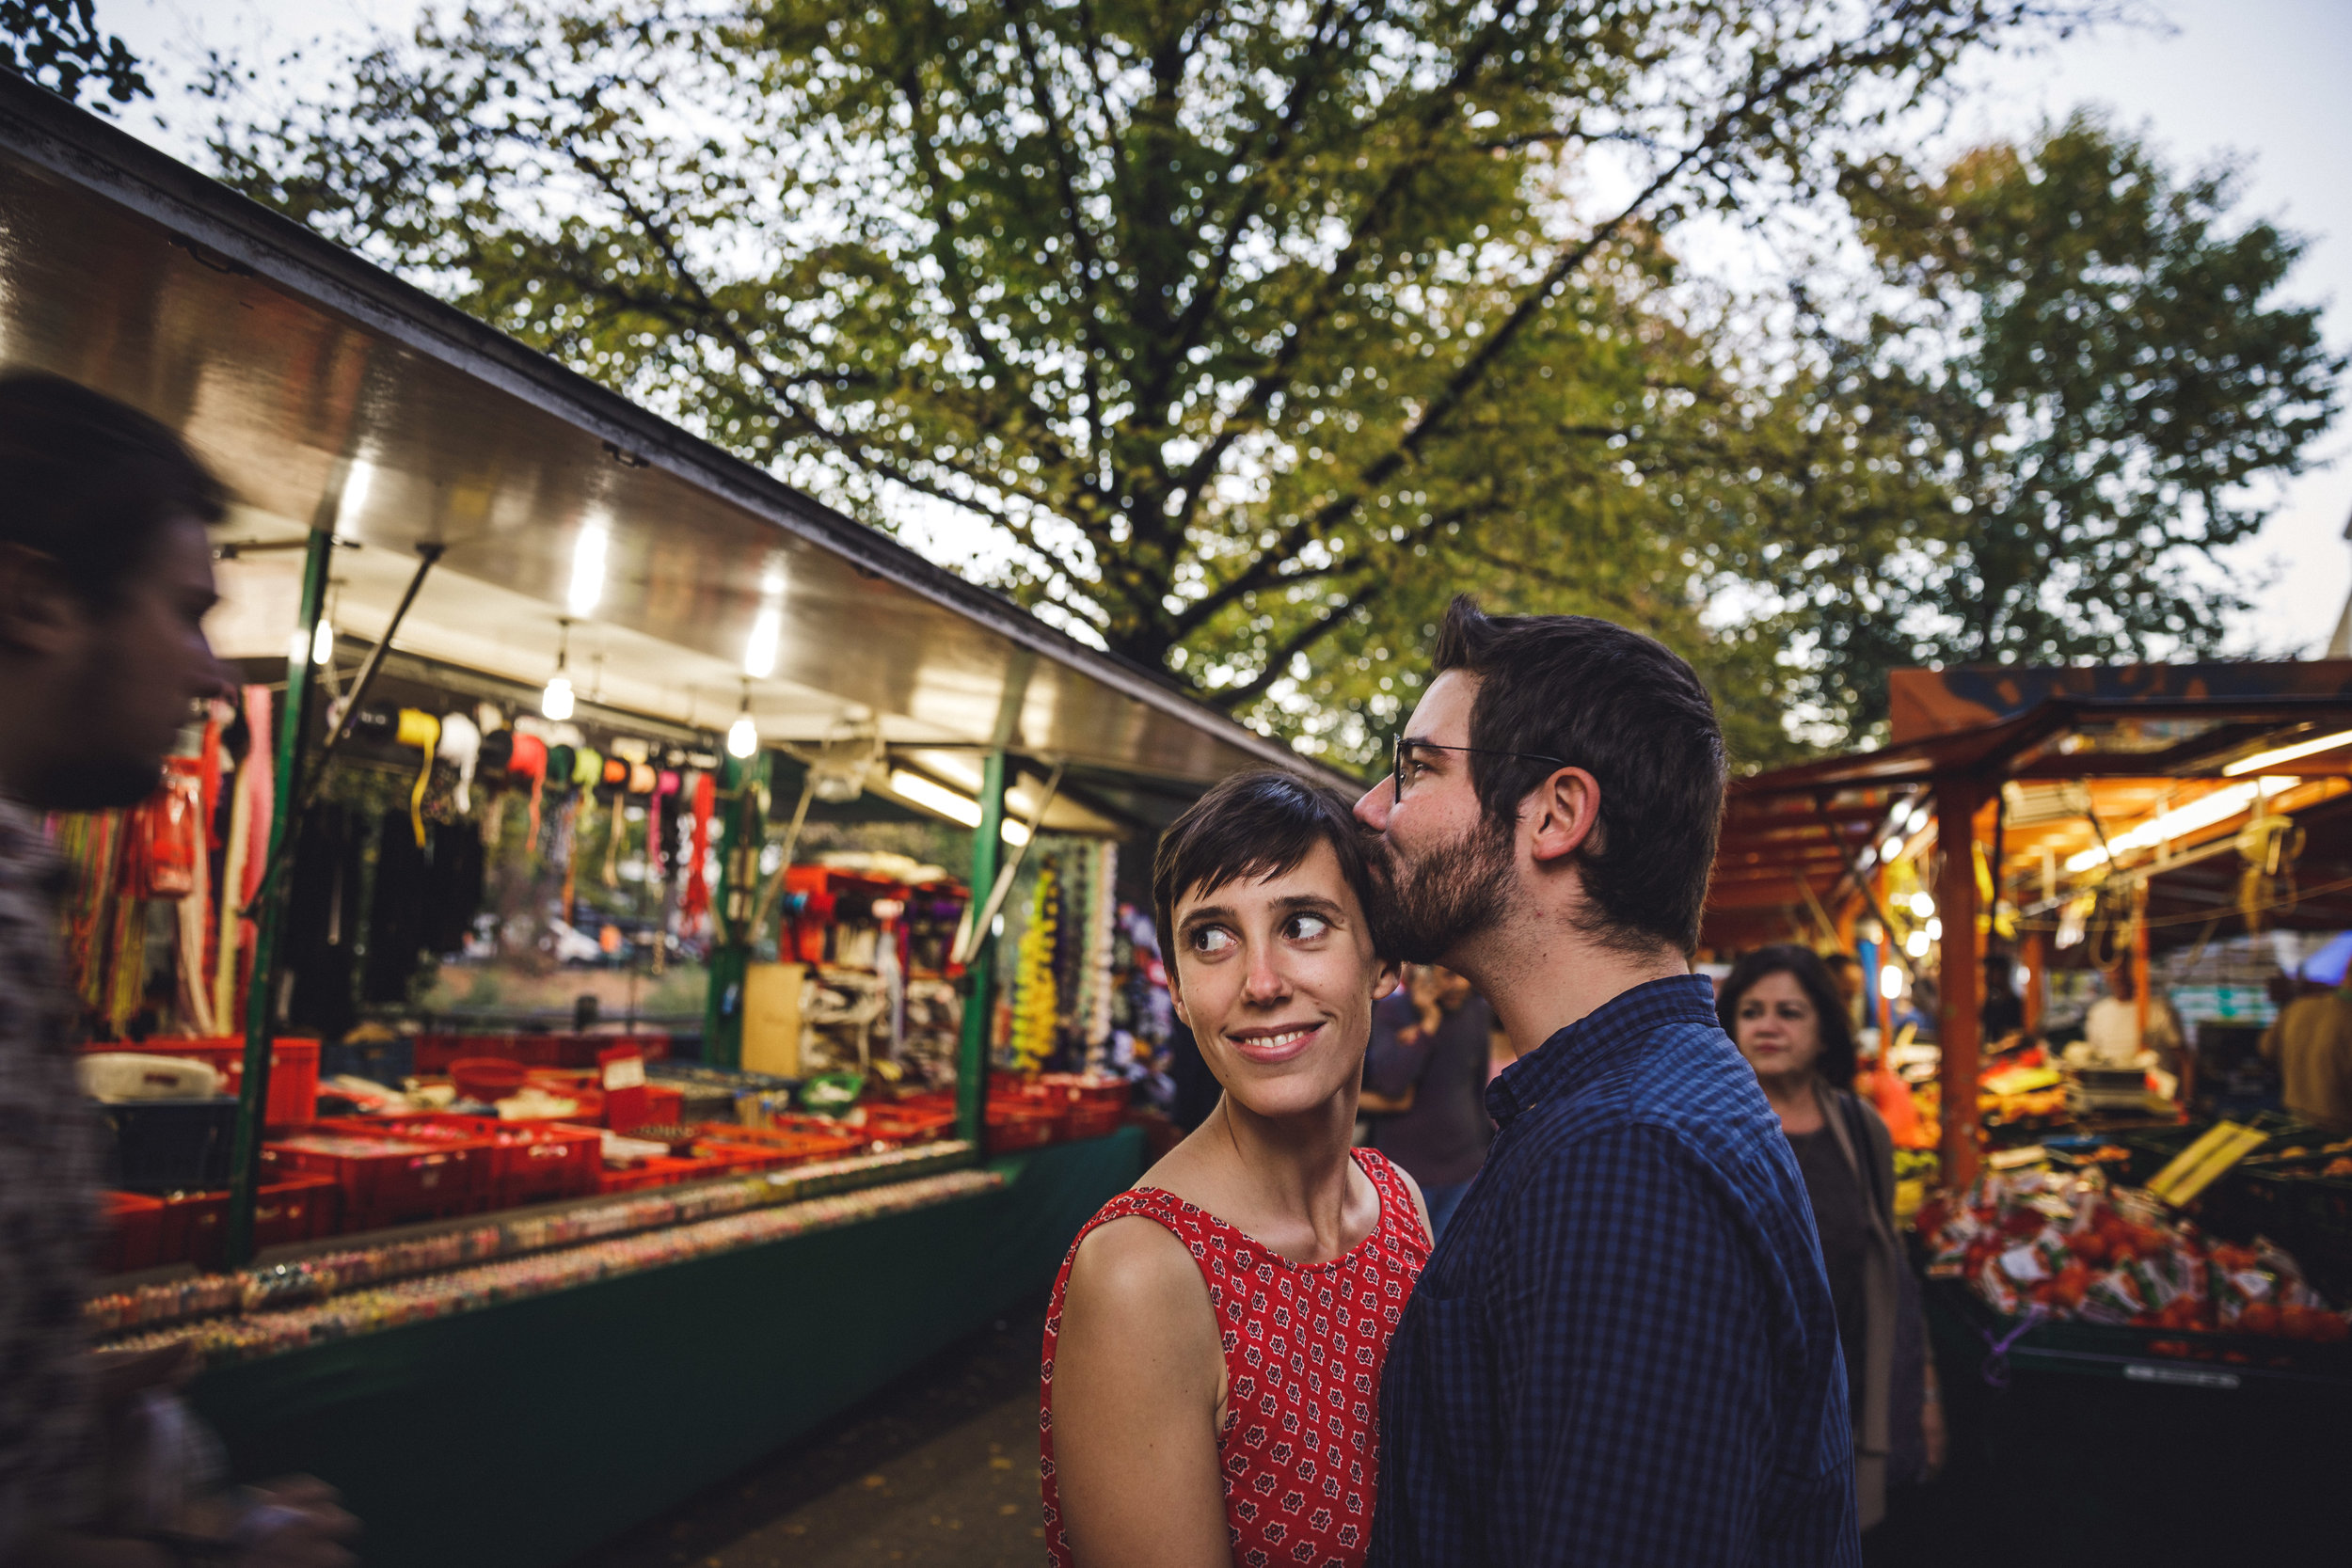 berlin engagement shoot, berlin couple photoshoot, berlin canal photoshoot, turkish market berlin